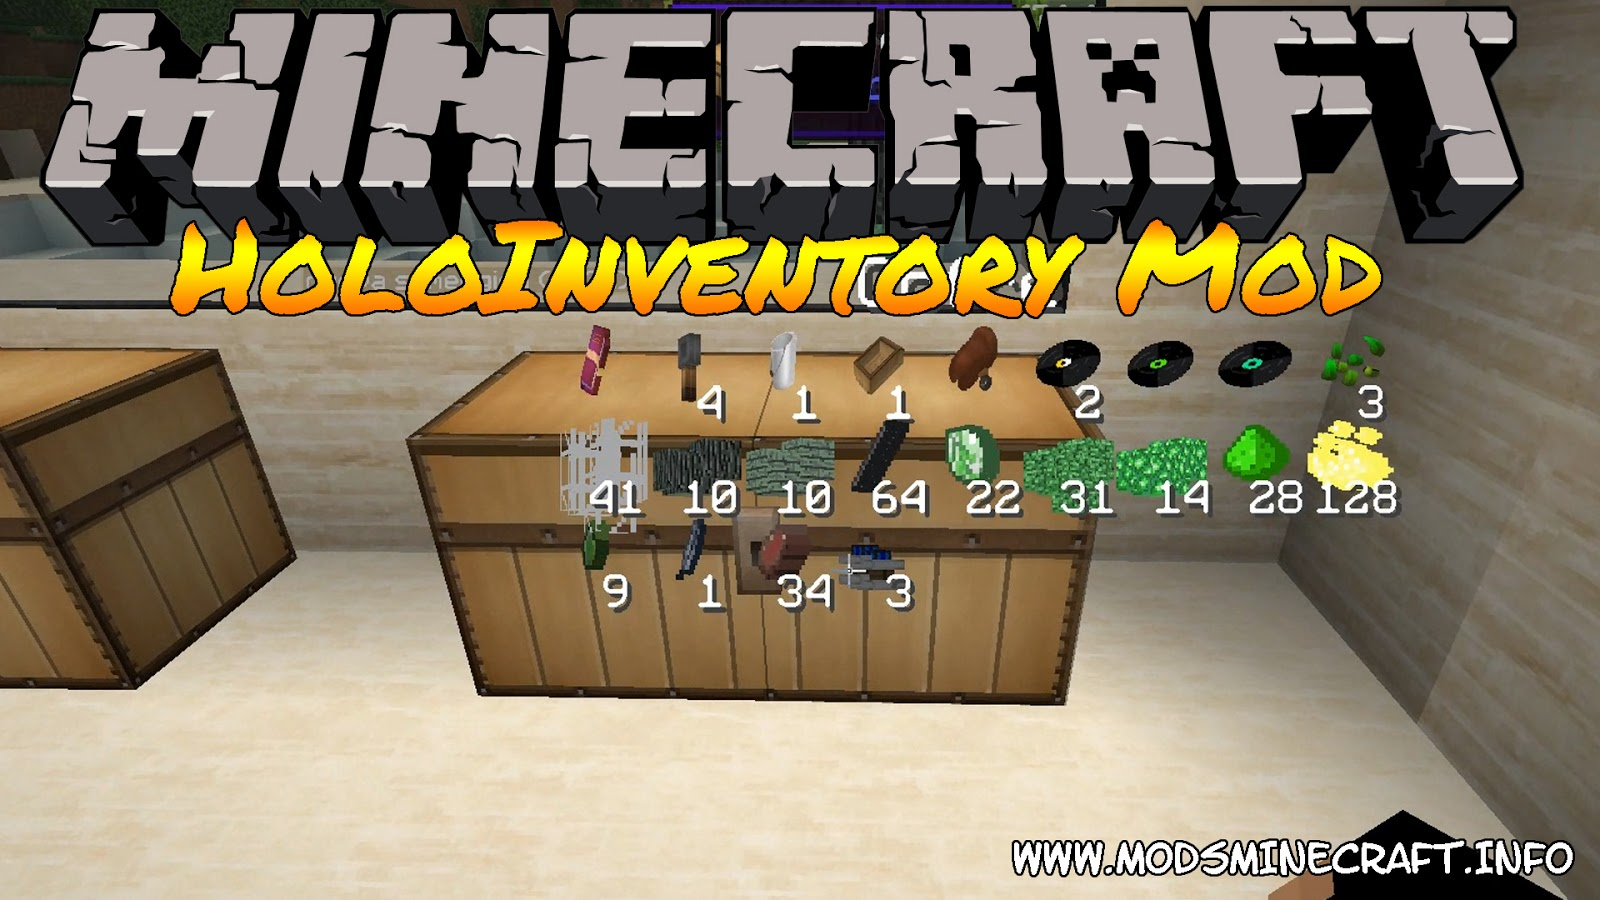 HoloInventory Mod para Minecraft 1.7.2, HoloInventory Mod, HoloInventory 1.7.2, minecraft HoloInventory Mod, minecraft mods, mods minecraft, minecraft mod 1.7.2, mods para minecraft, descargar mods para minecraft, minecraft cómo descargar mods, cómo instalar mods, minecraft cómo instalar mods, cómo instalar mods minecraft, minecraft 1.7.2